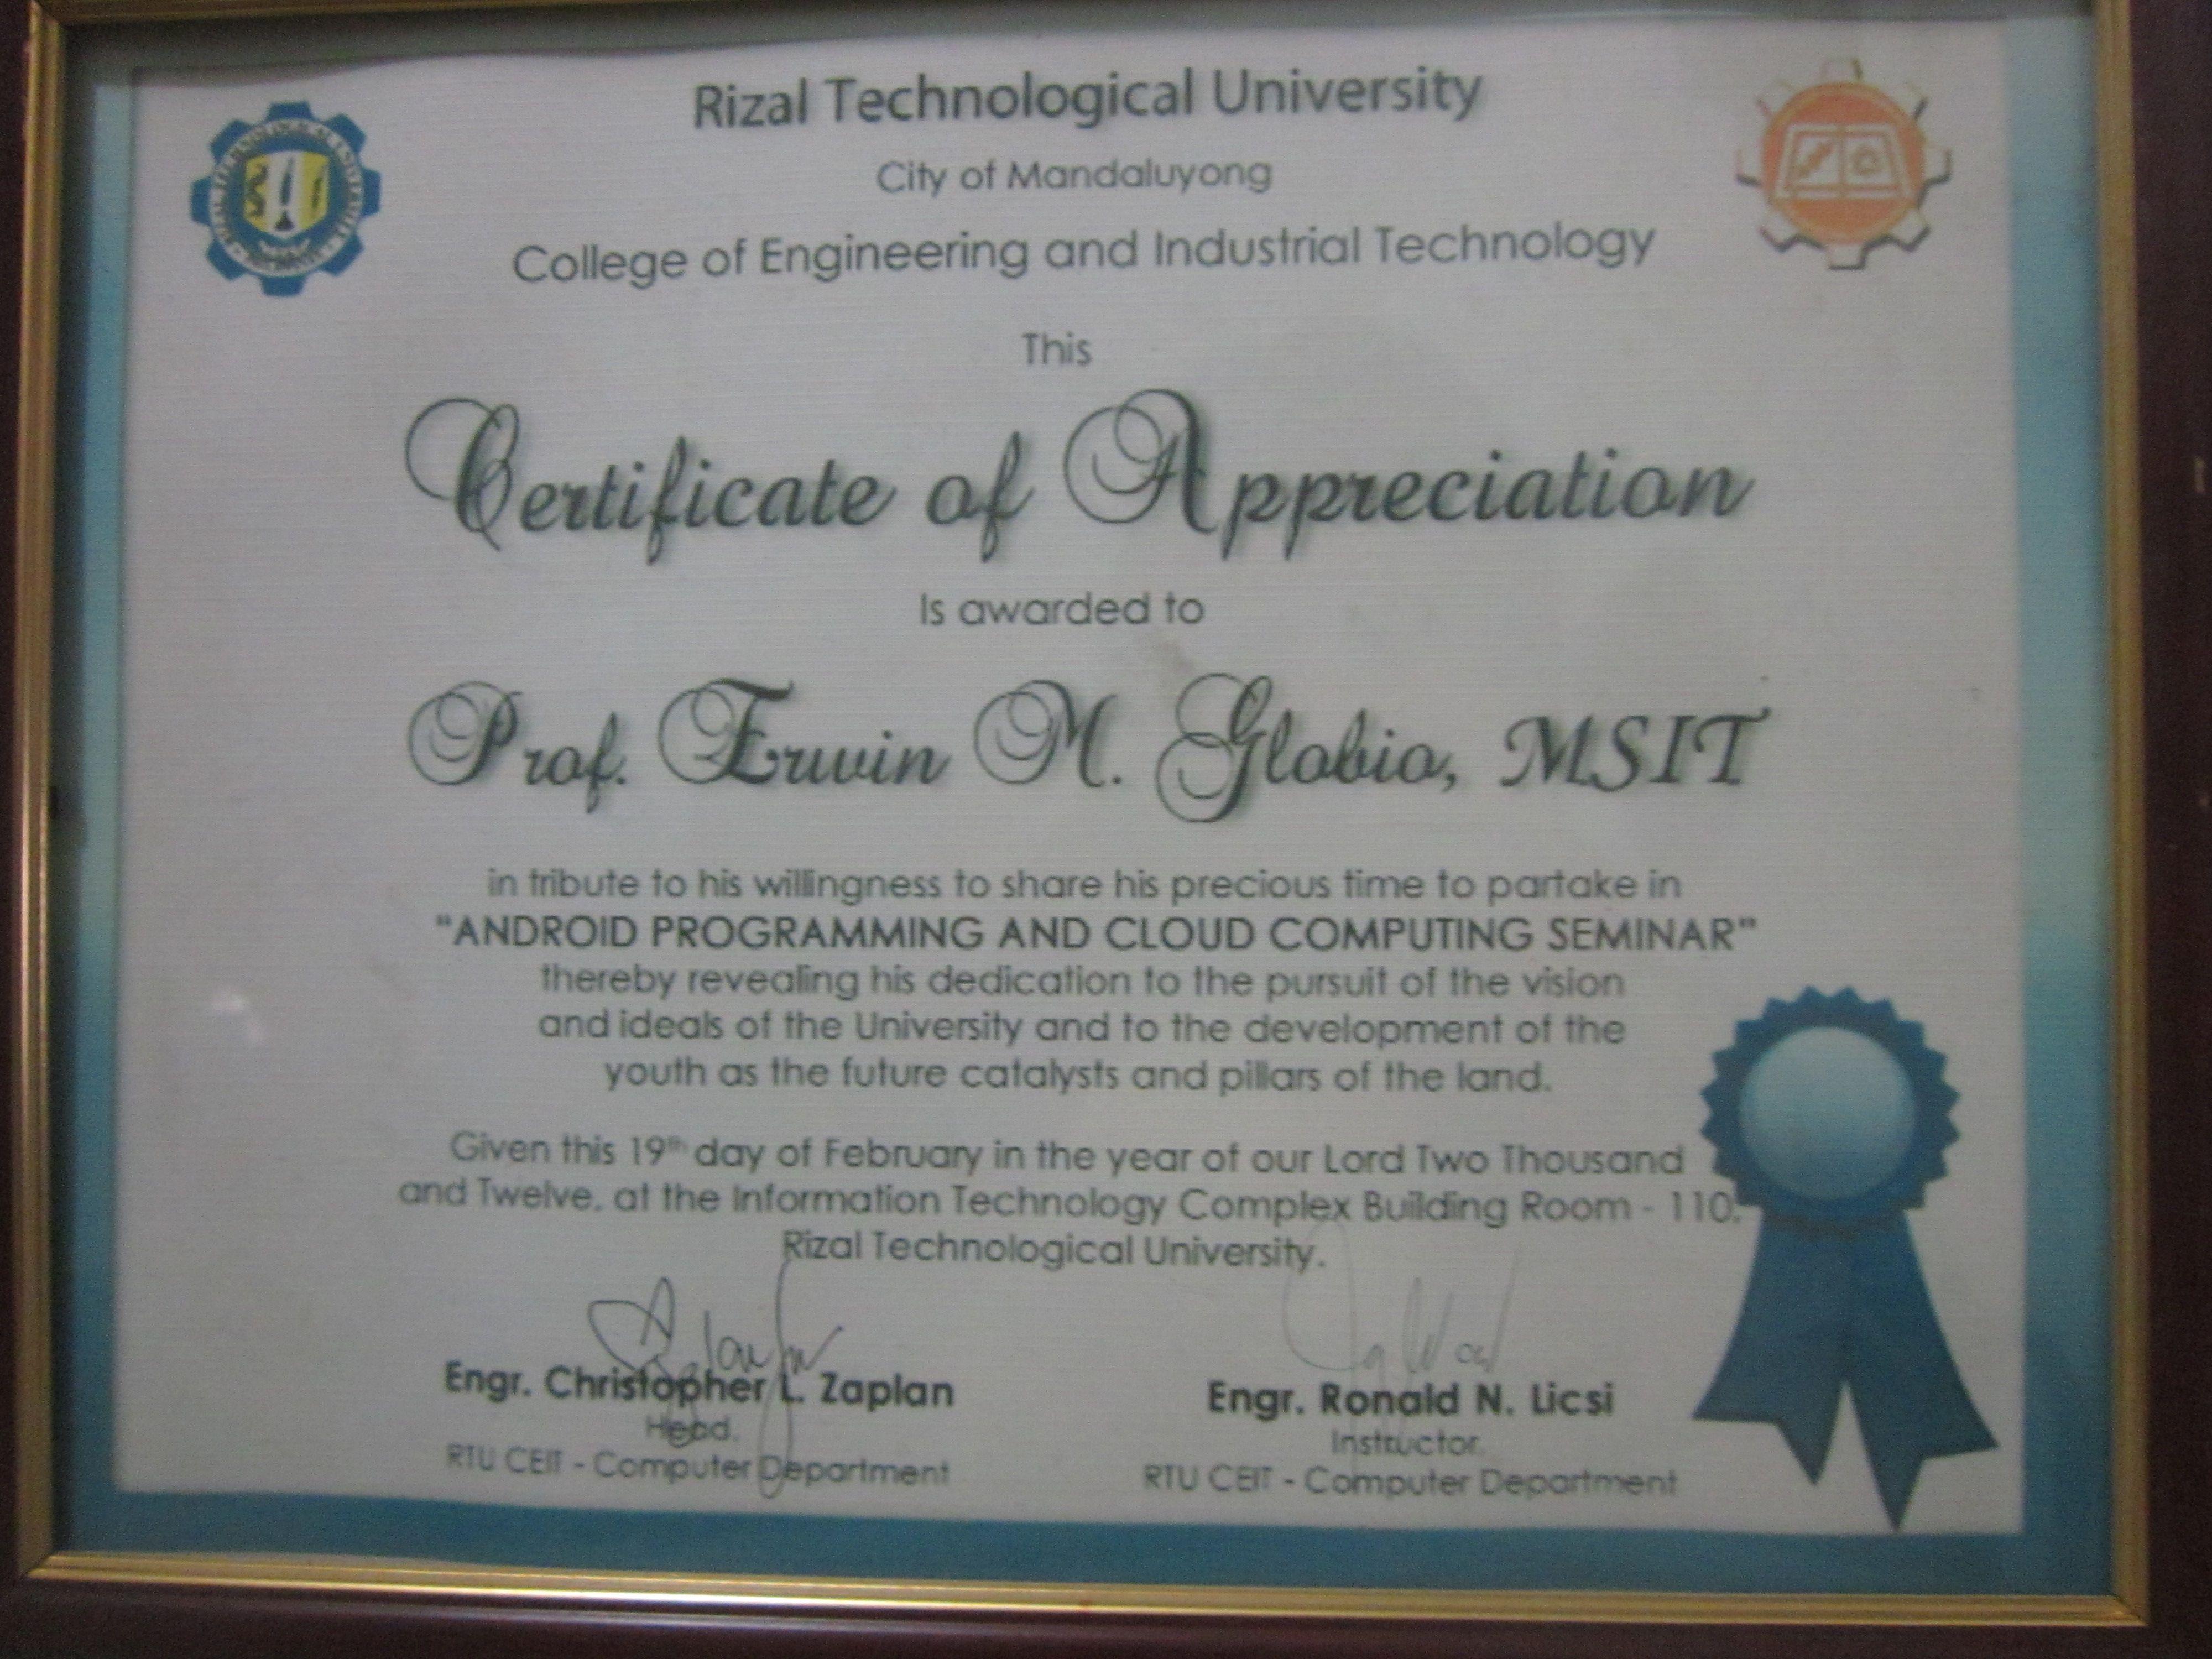 Prof erwin globios certificate of appreciation http erwin globios certificate of appreciation httpeglobiotraining resource speakers certificate pinterest certificate yelopaper Gallery